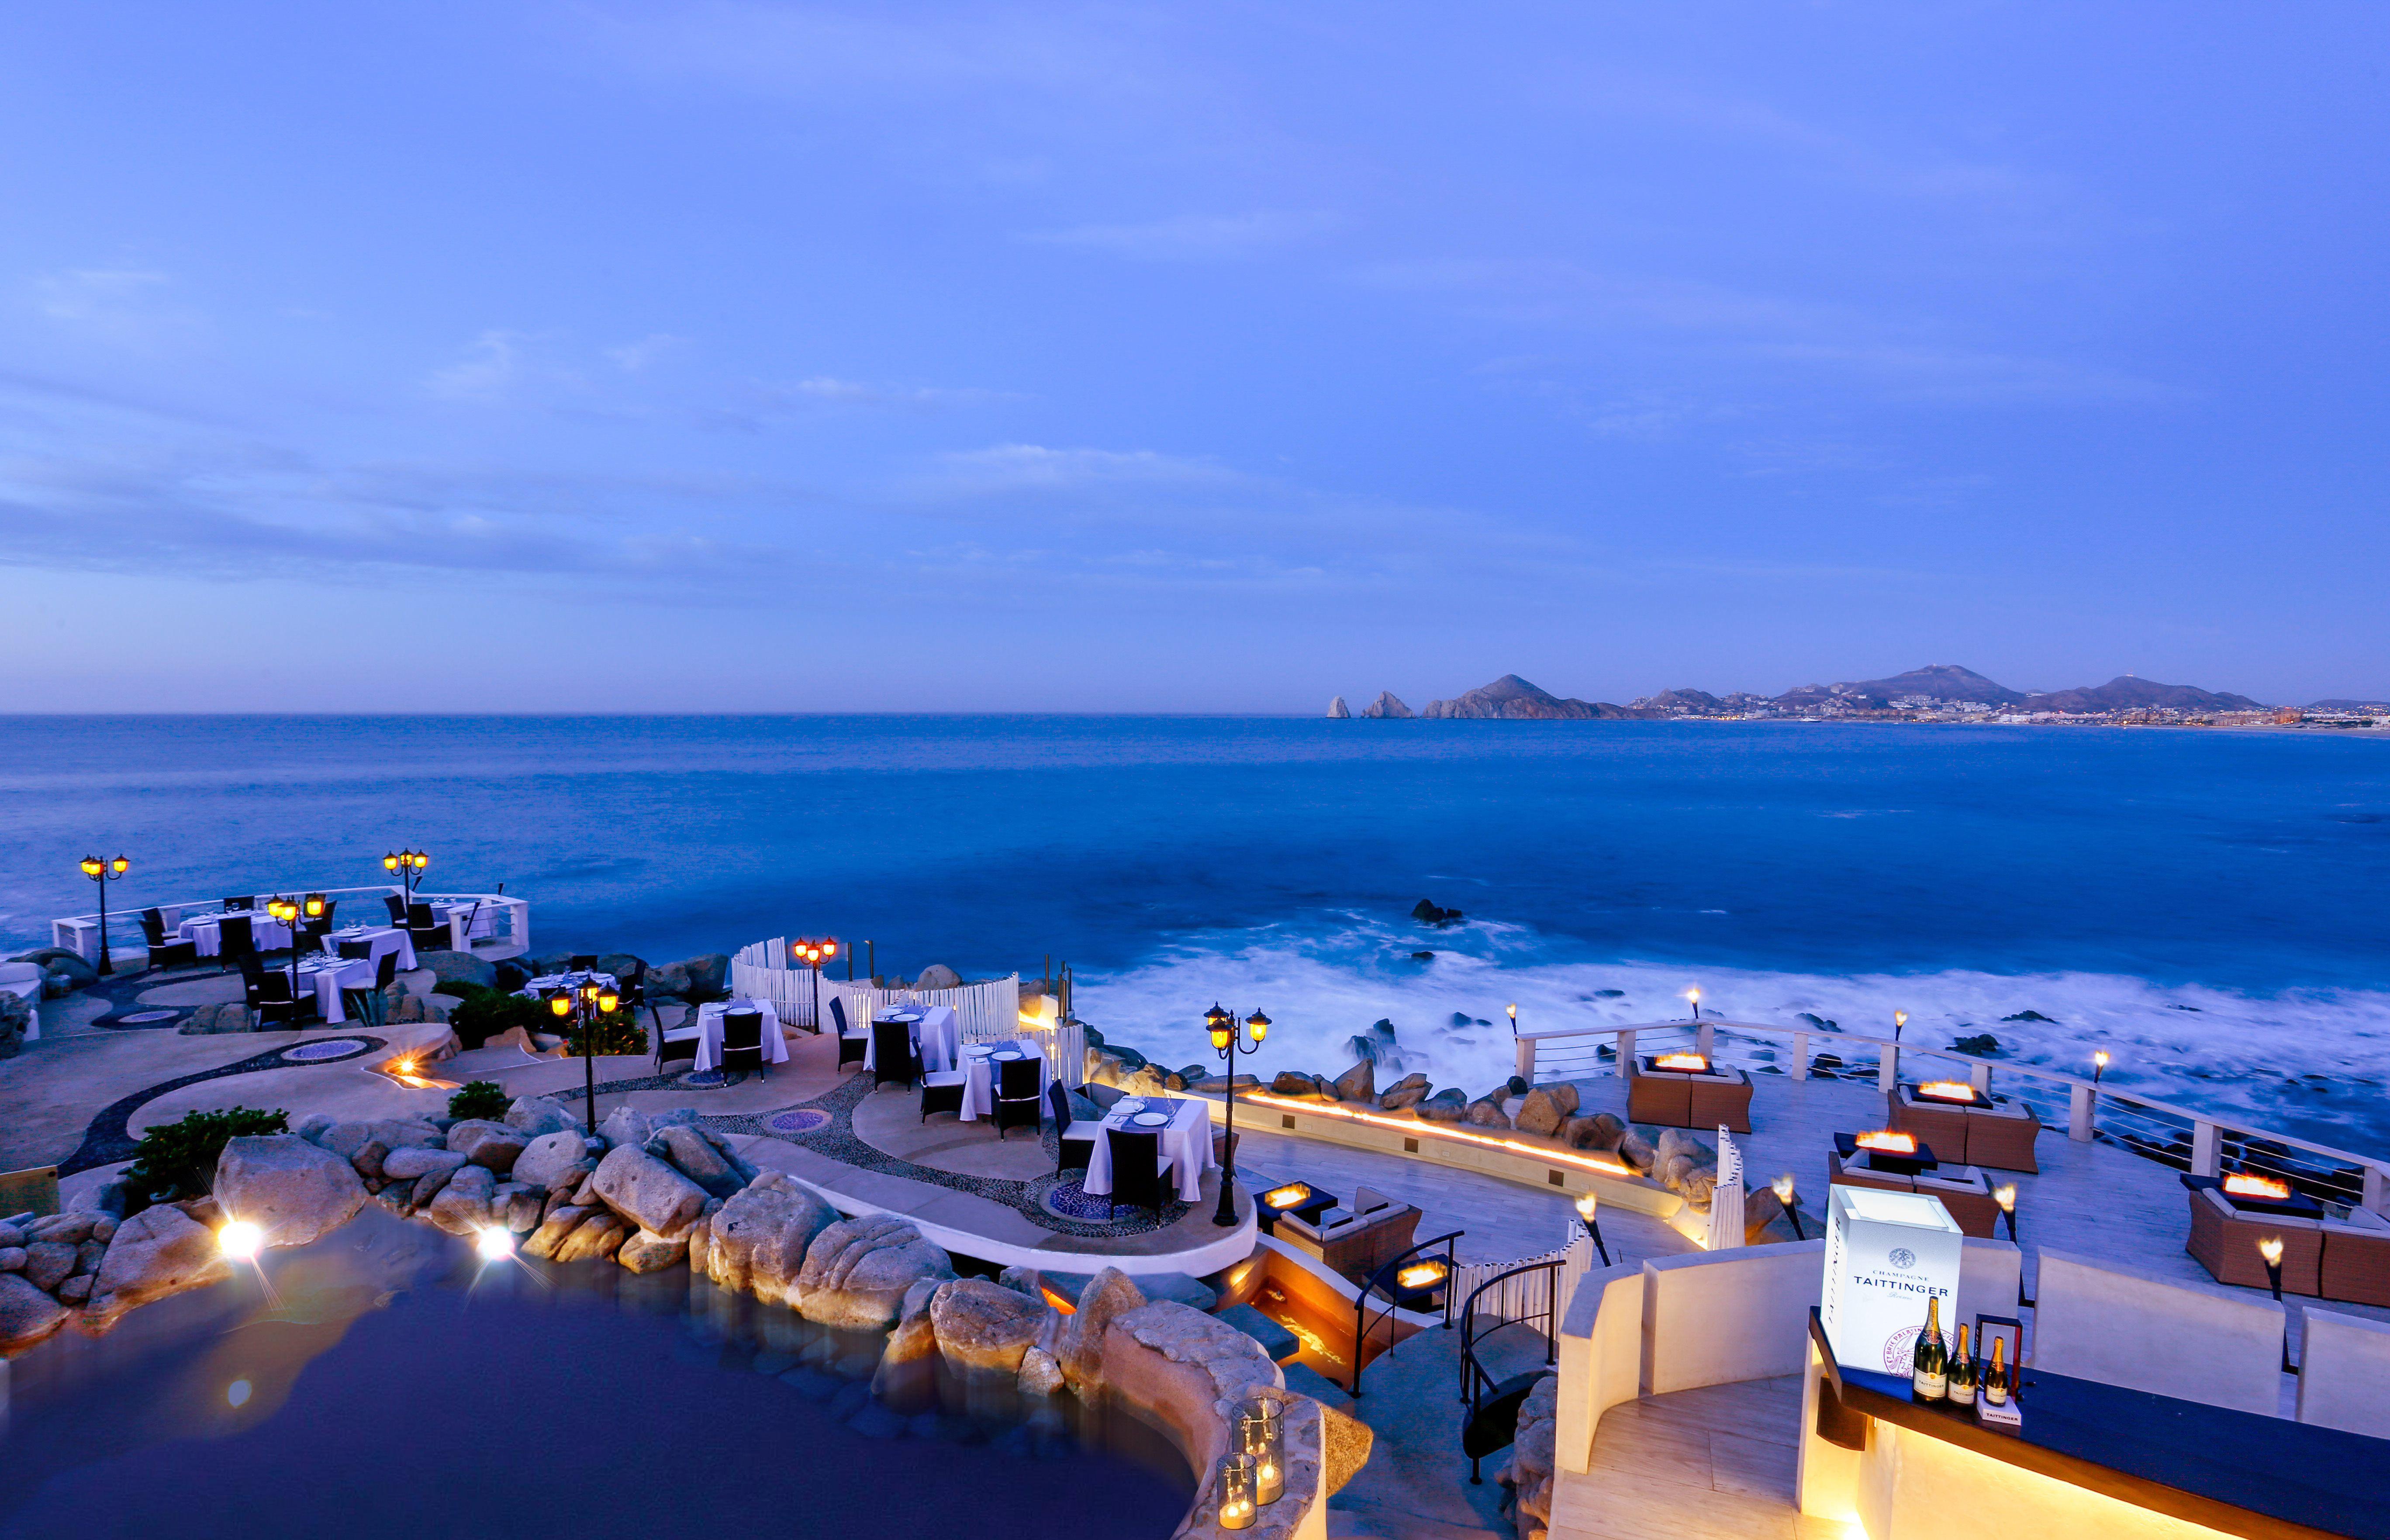 Terrace overlooking El Arco at Sunset da Mona Lisa, Cabo San Lucas